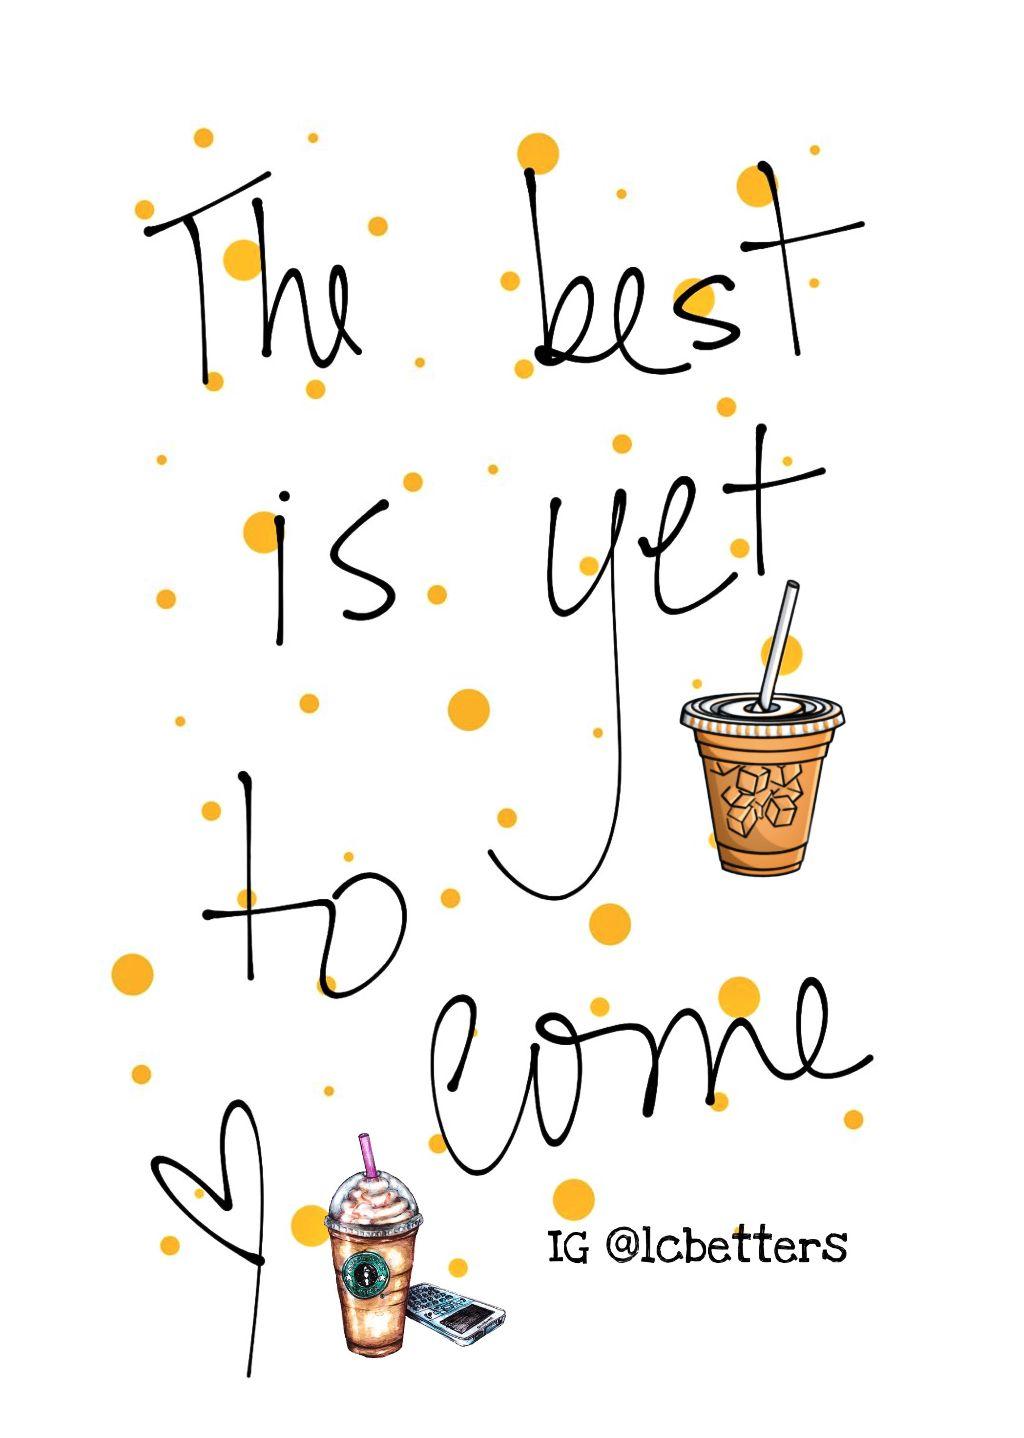 #freetoedit Lo mejor está por venir • #goodnight #buenasnoches #boanoite #motivationalquotes #inspirationalquotes  #quotestoliveby #quoteoftheday #quotesaboutlife #quotestoremember #dailymotivation #dailyquotes #coffee #café #cafeconleche #cafeteria #coffeeshop #coffeetime #coffeelover #coffeelovers #coffeeshops #coffeehouse #coffee_inst #coffeequotes #coffeetable #coffee_time #coffee☕ #coffeecoffeecoffee #coffeetime☕ #coffeeislove